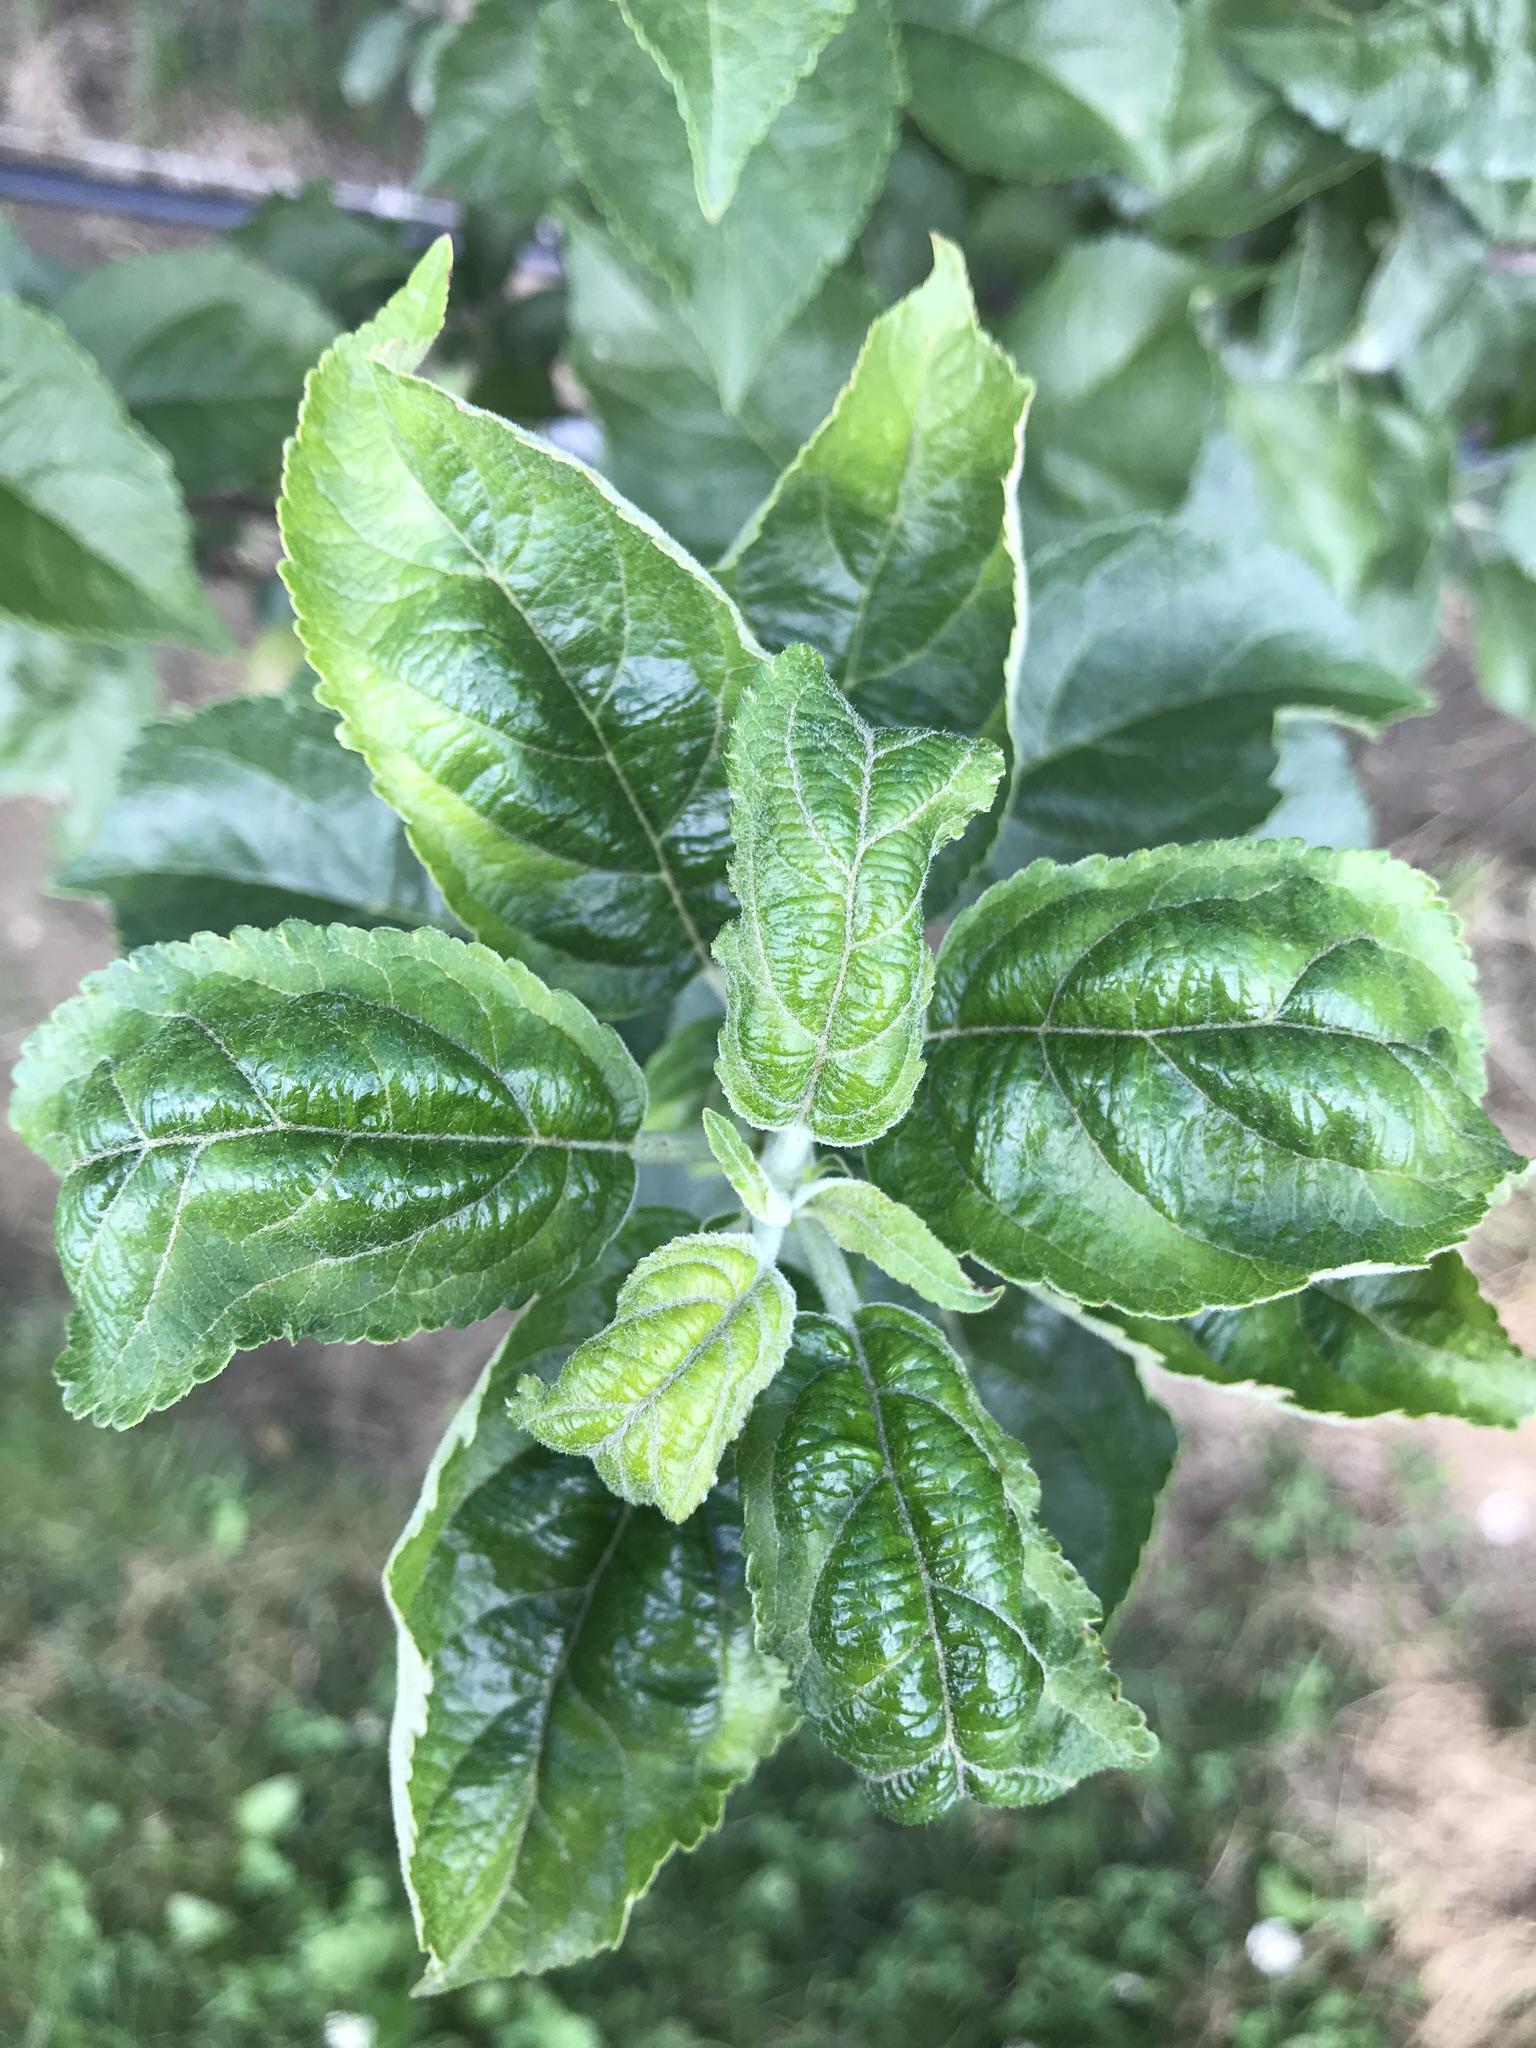 Potato leafhopper damage to apple terminal